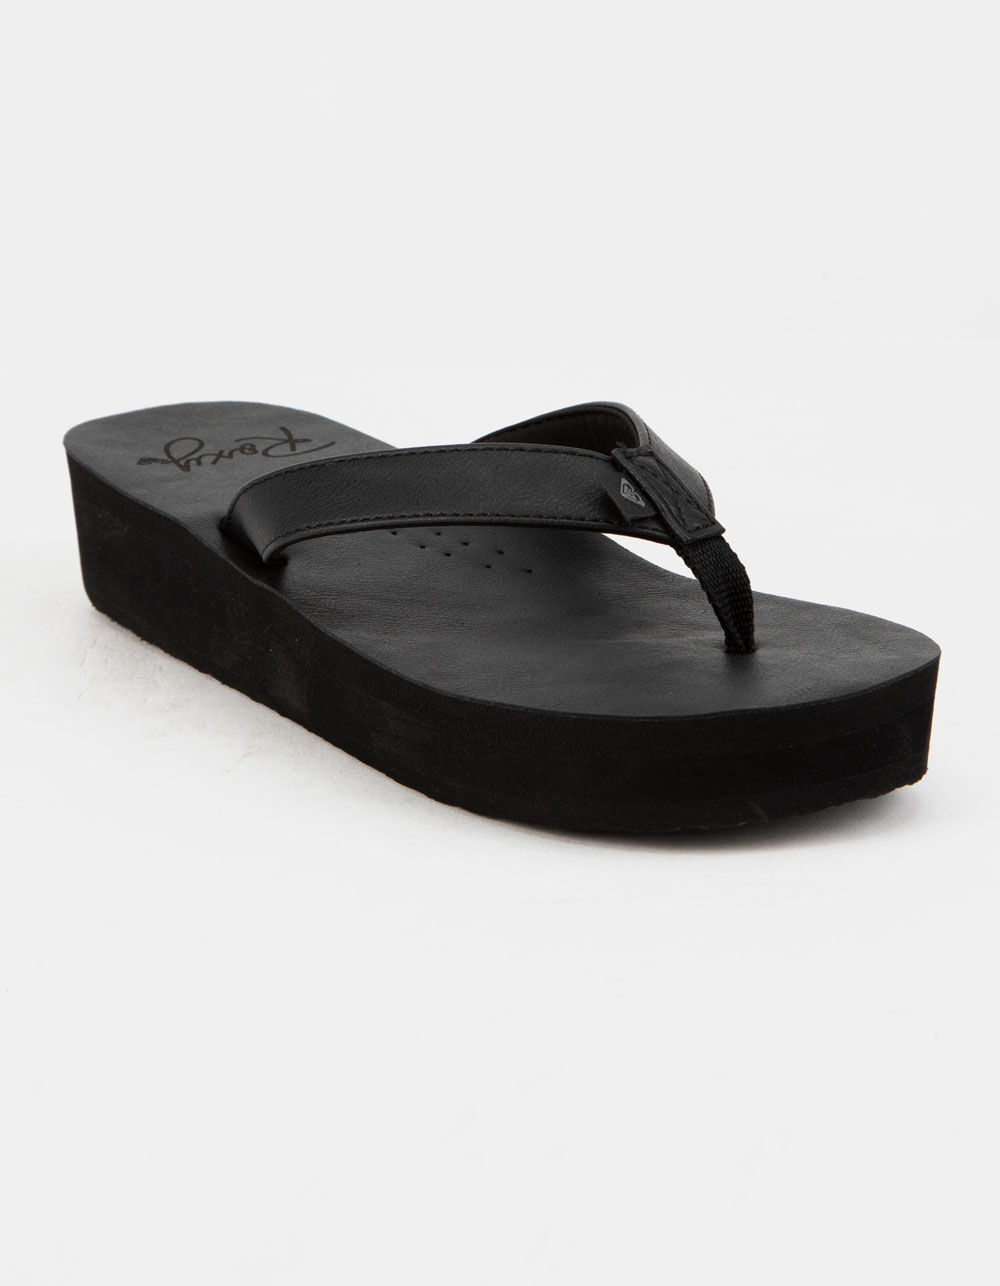 ROXY Melinda Black Platform Sandals